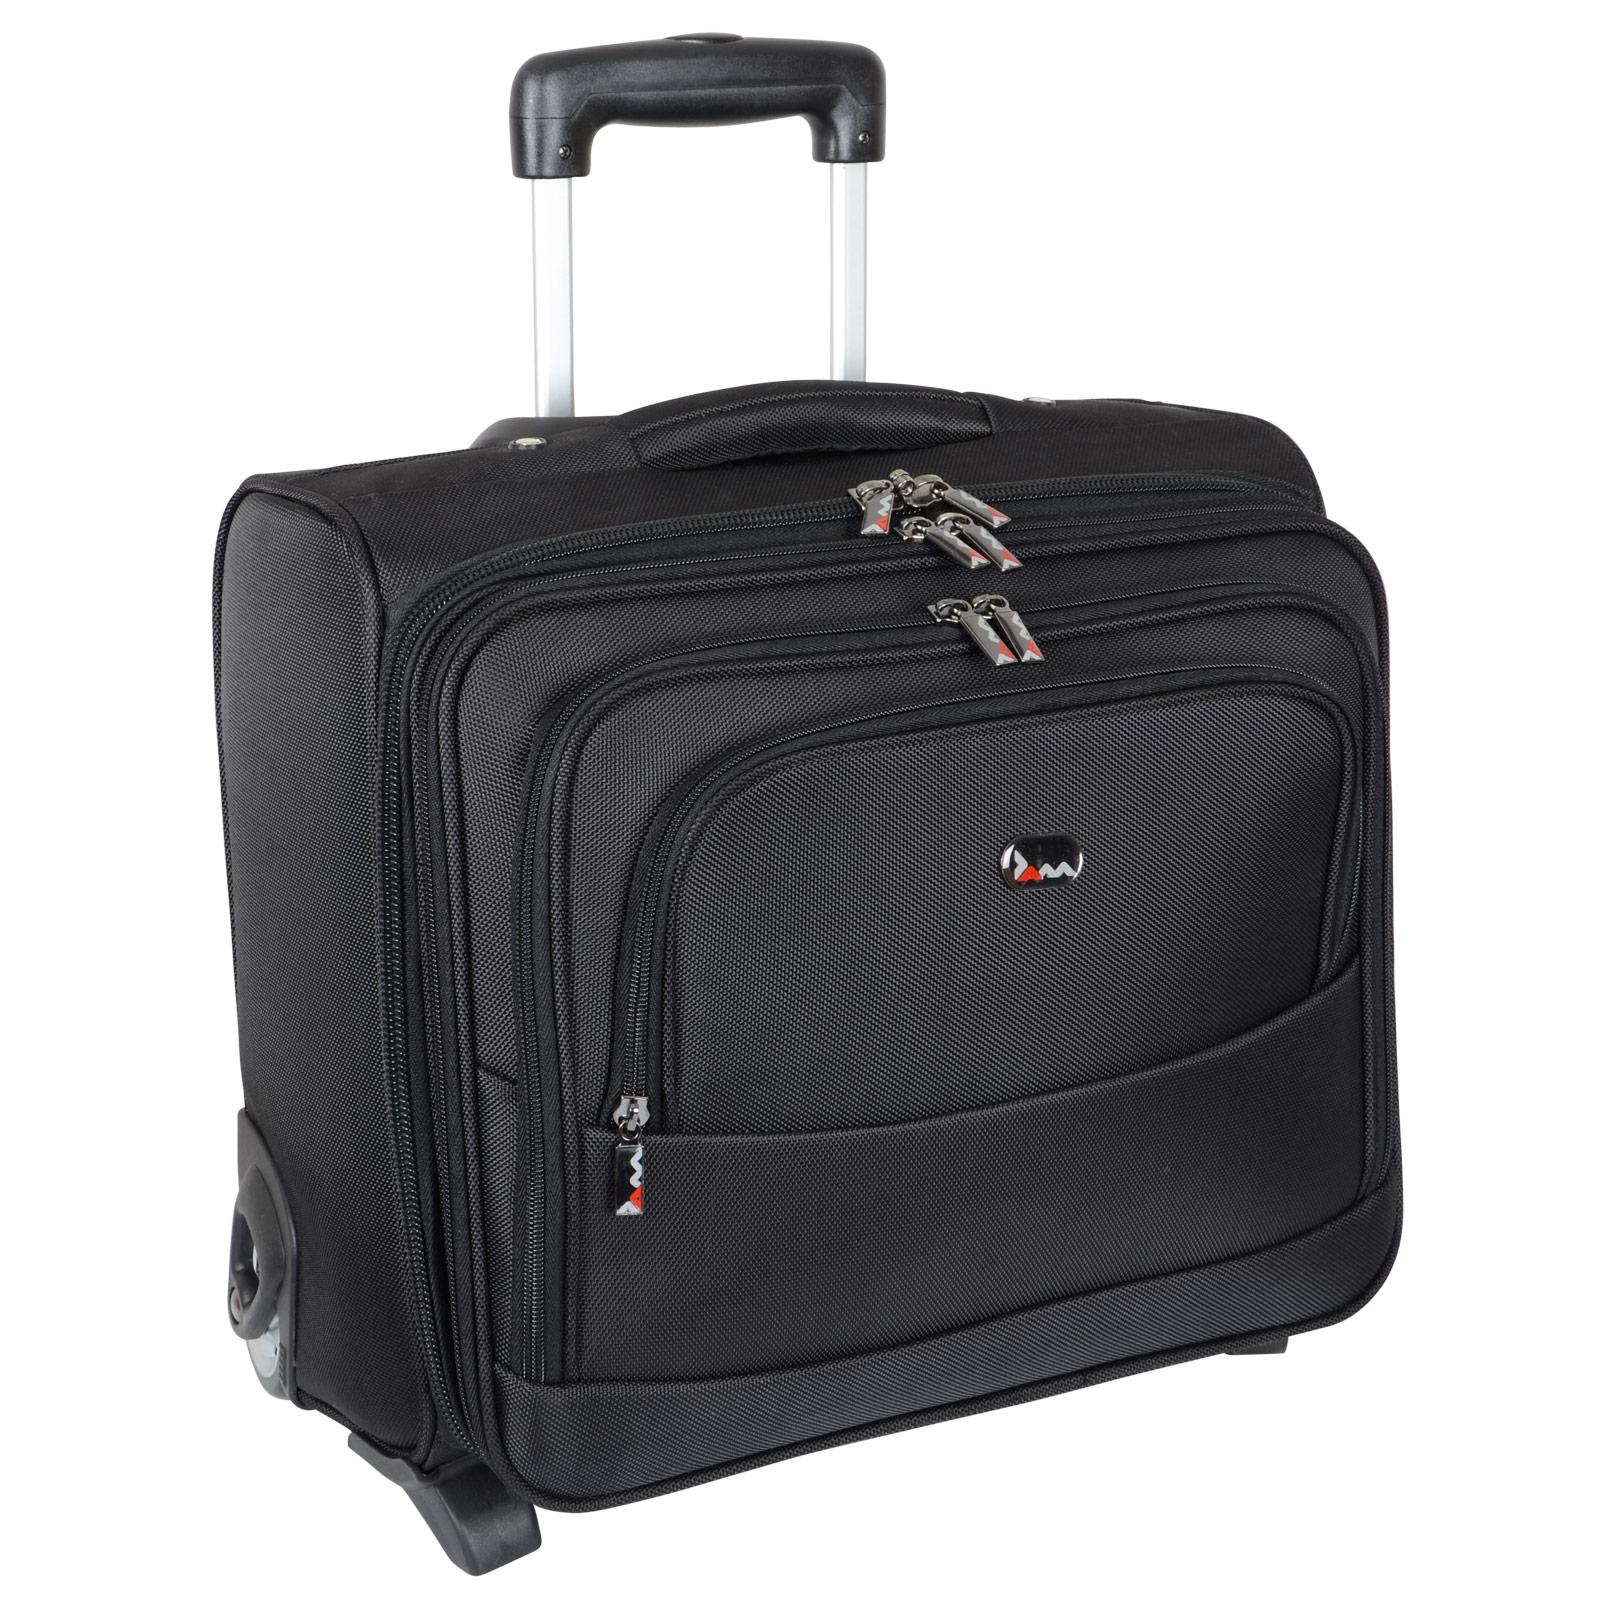 Boston Business Trolley Case Laptop Bag Overnight Flight ...